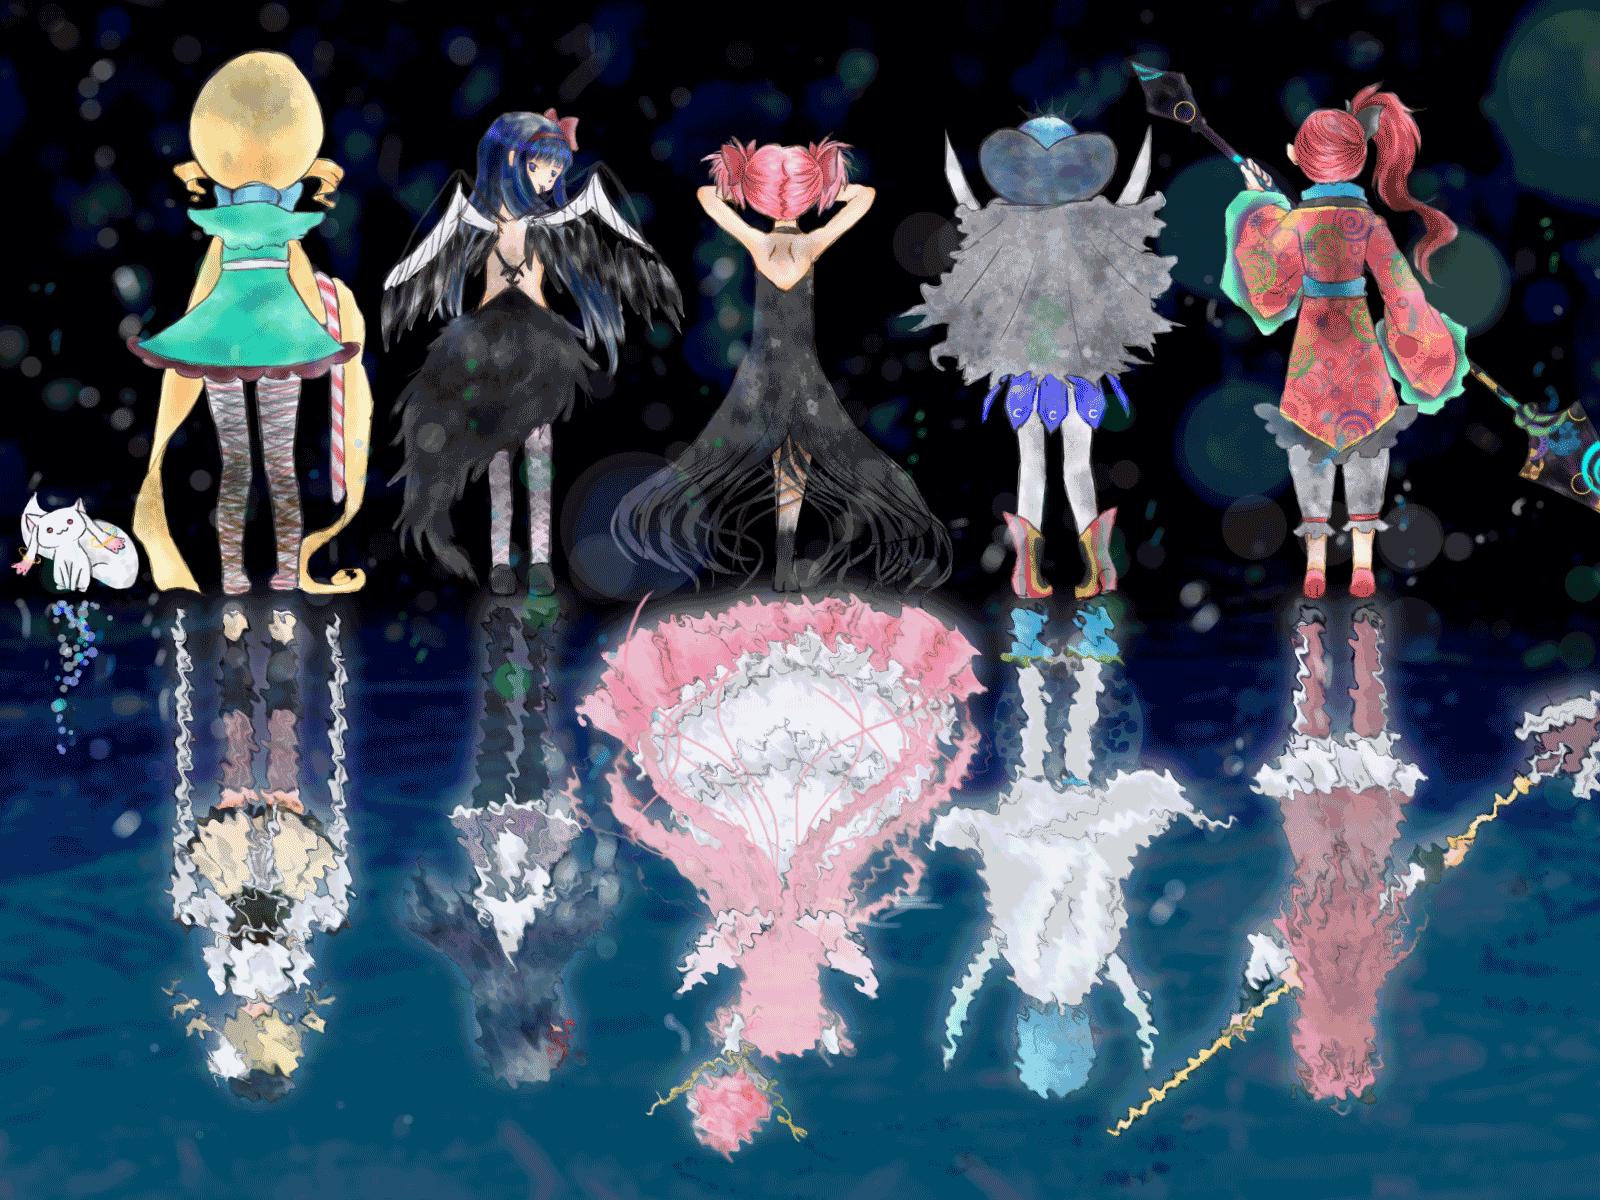 Magica Mobili ~ Puella magi madoka magica all 5 witch and magical girl fitness